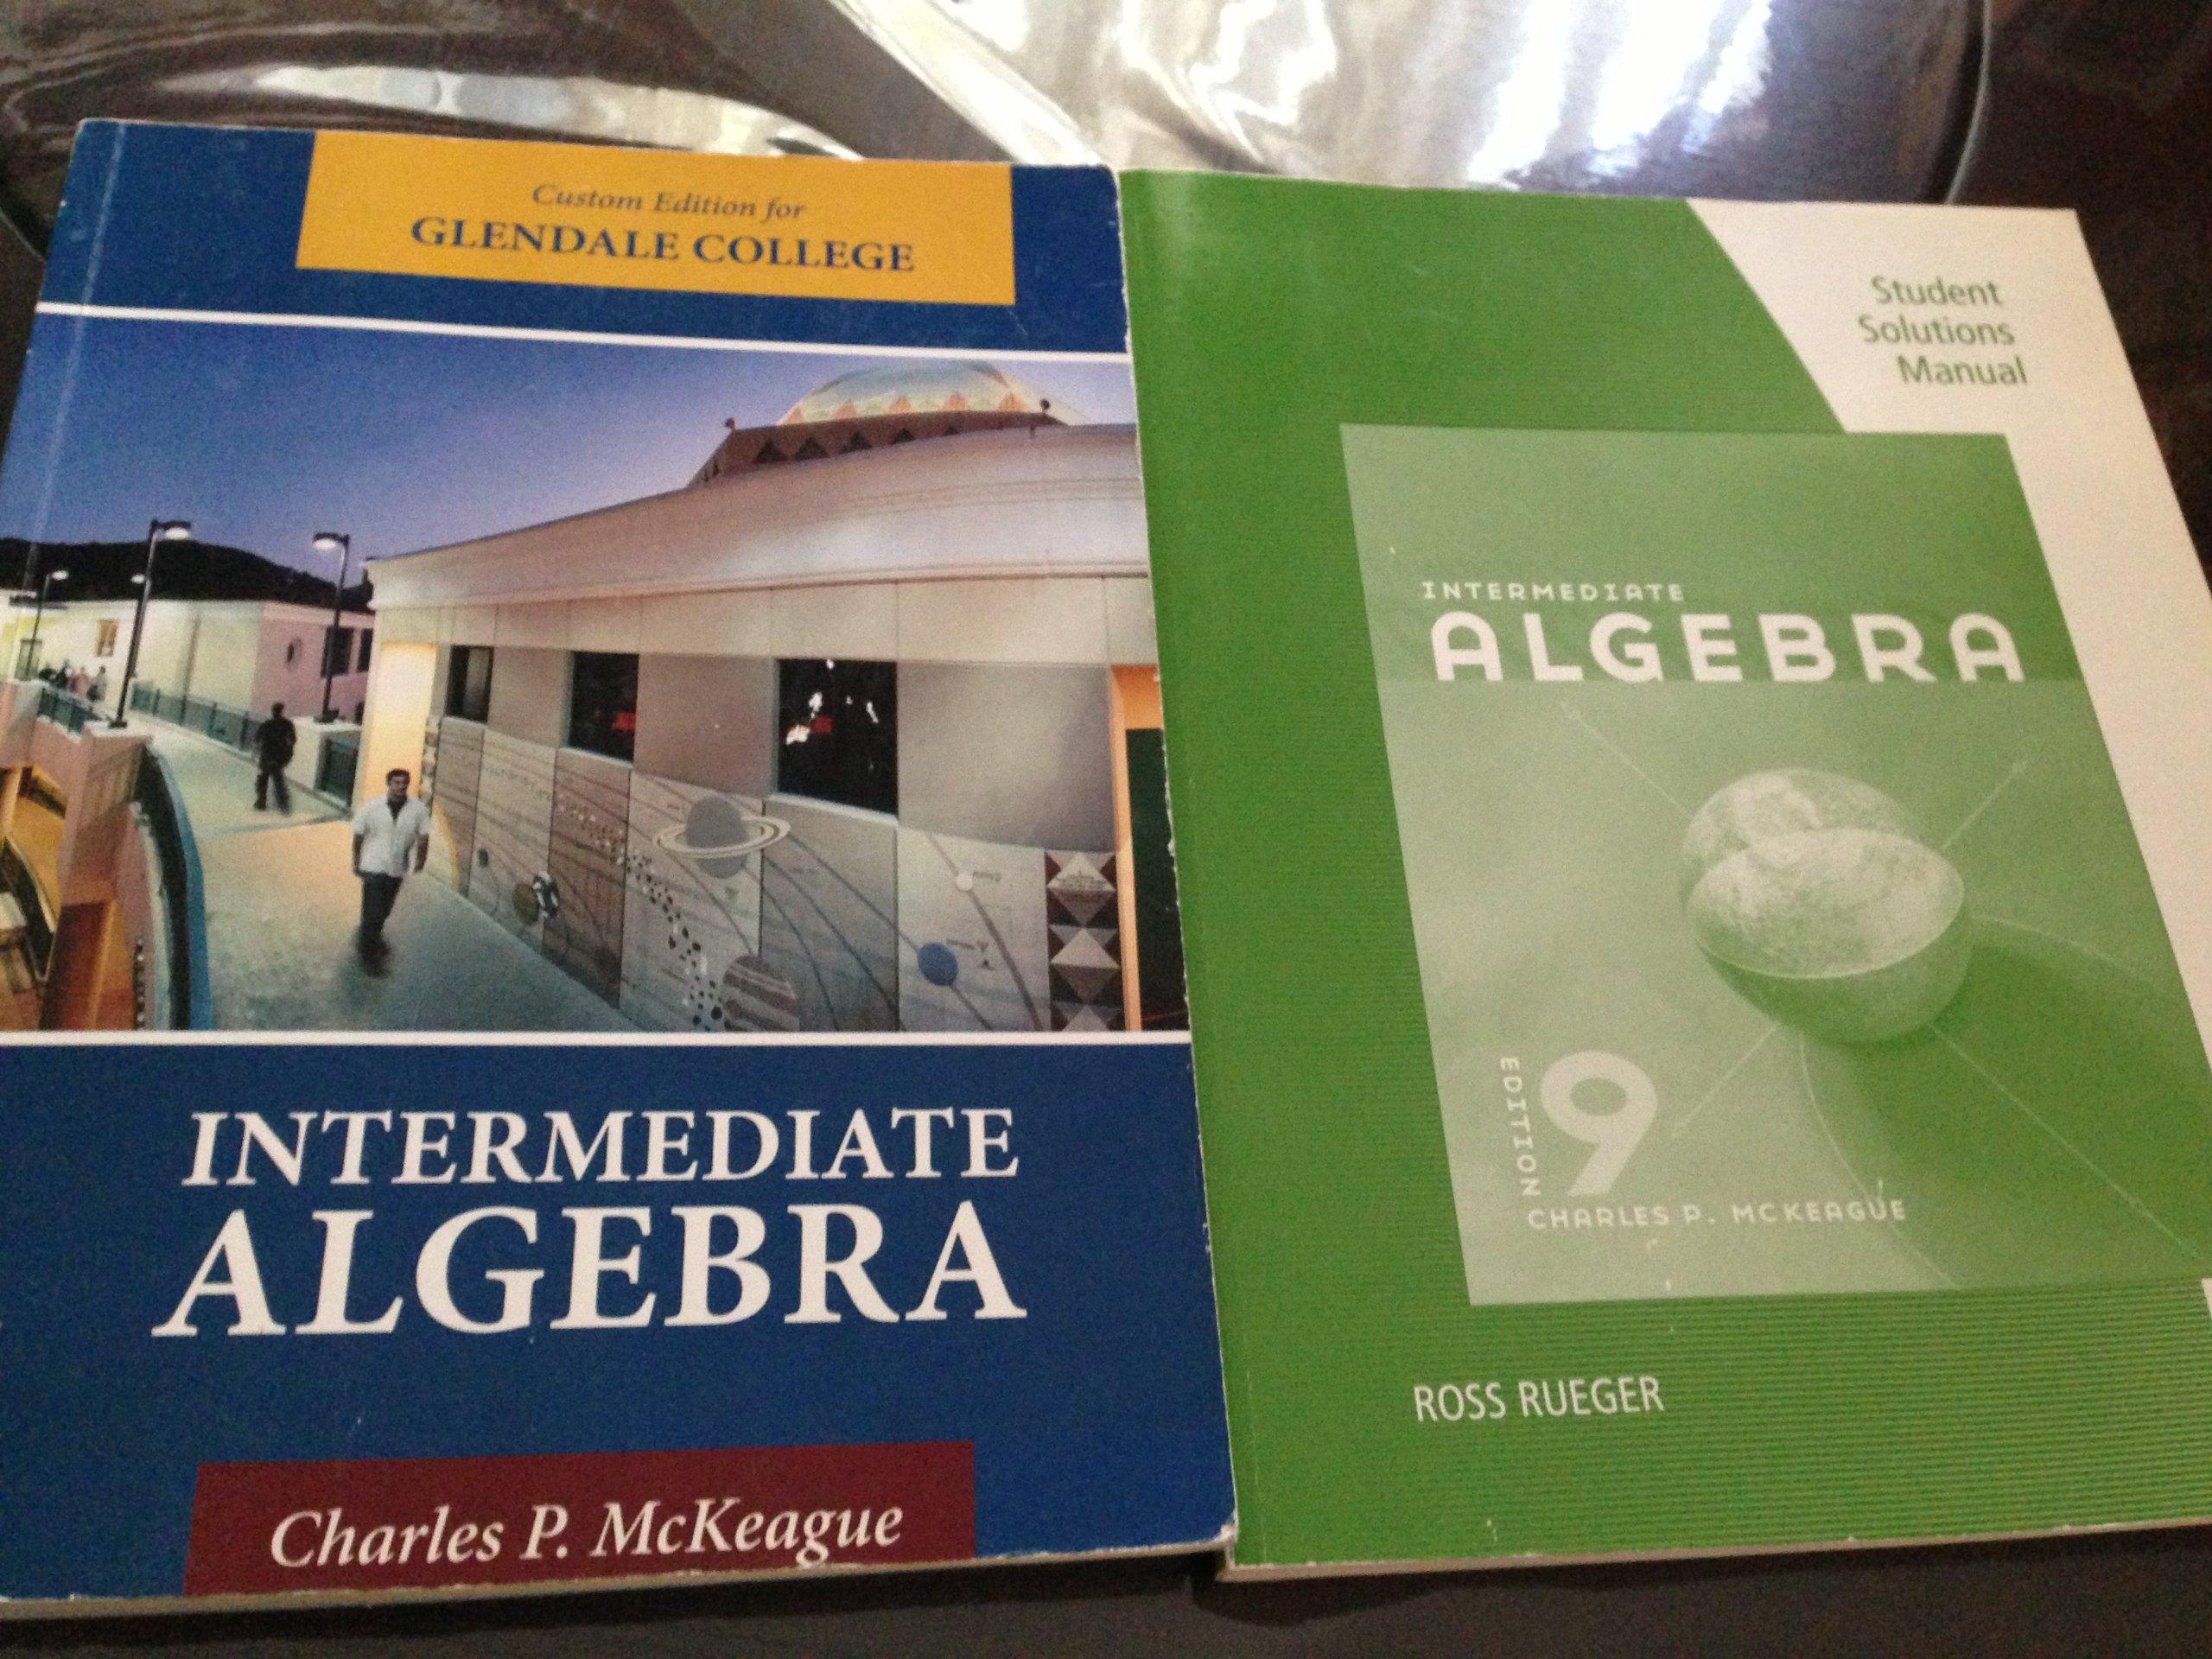 Intermediate Algebra: Glendale Community College Edition: Charles P.  McKeague: 9781111752057: Amazon.com: Books